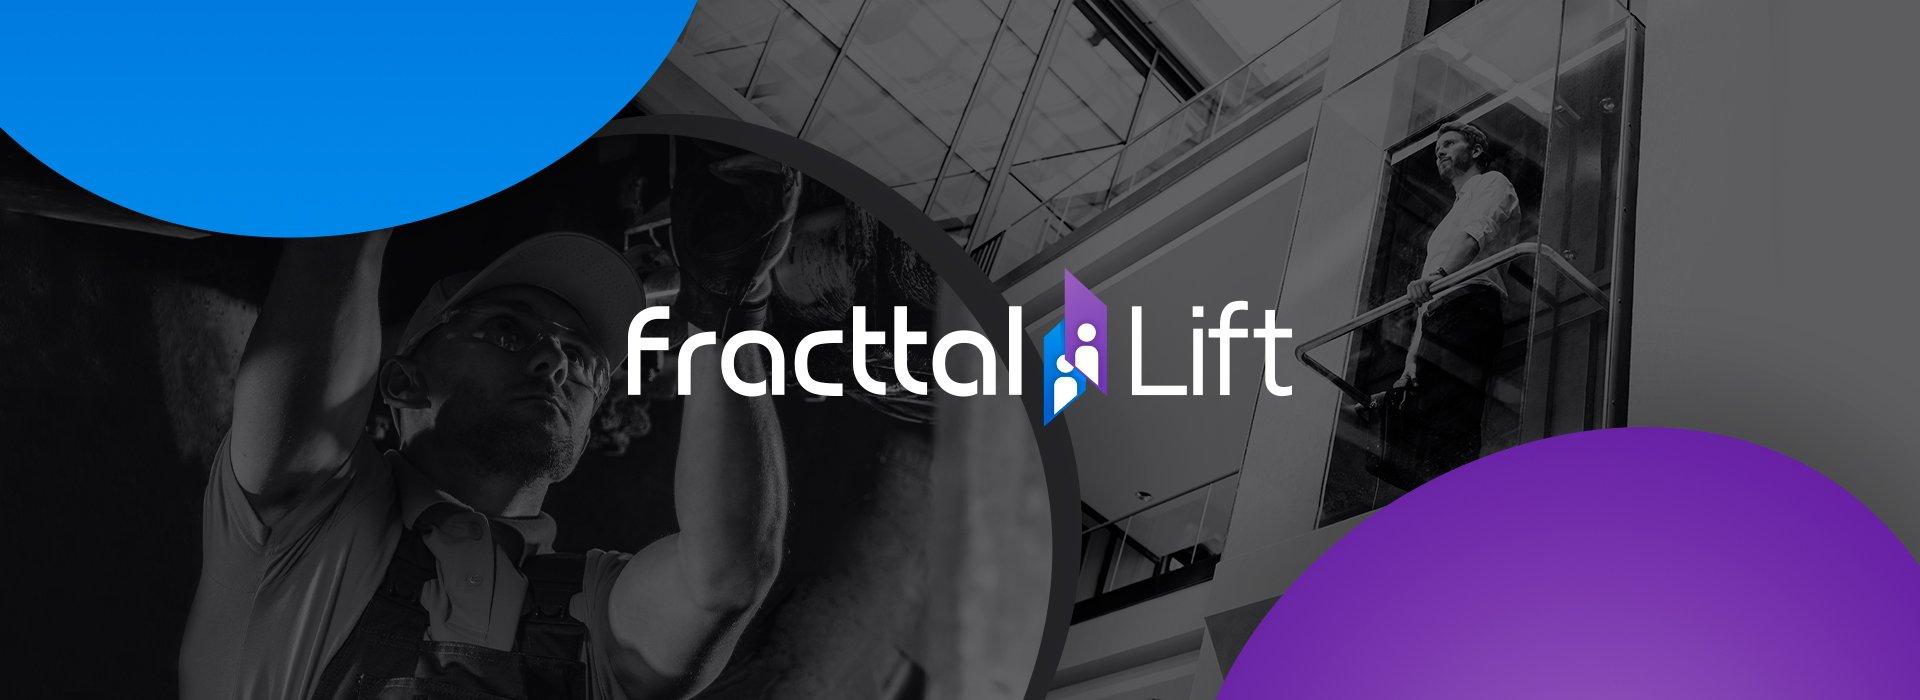 cover_fracttal-lift